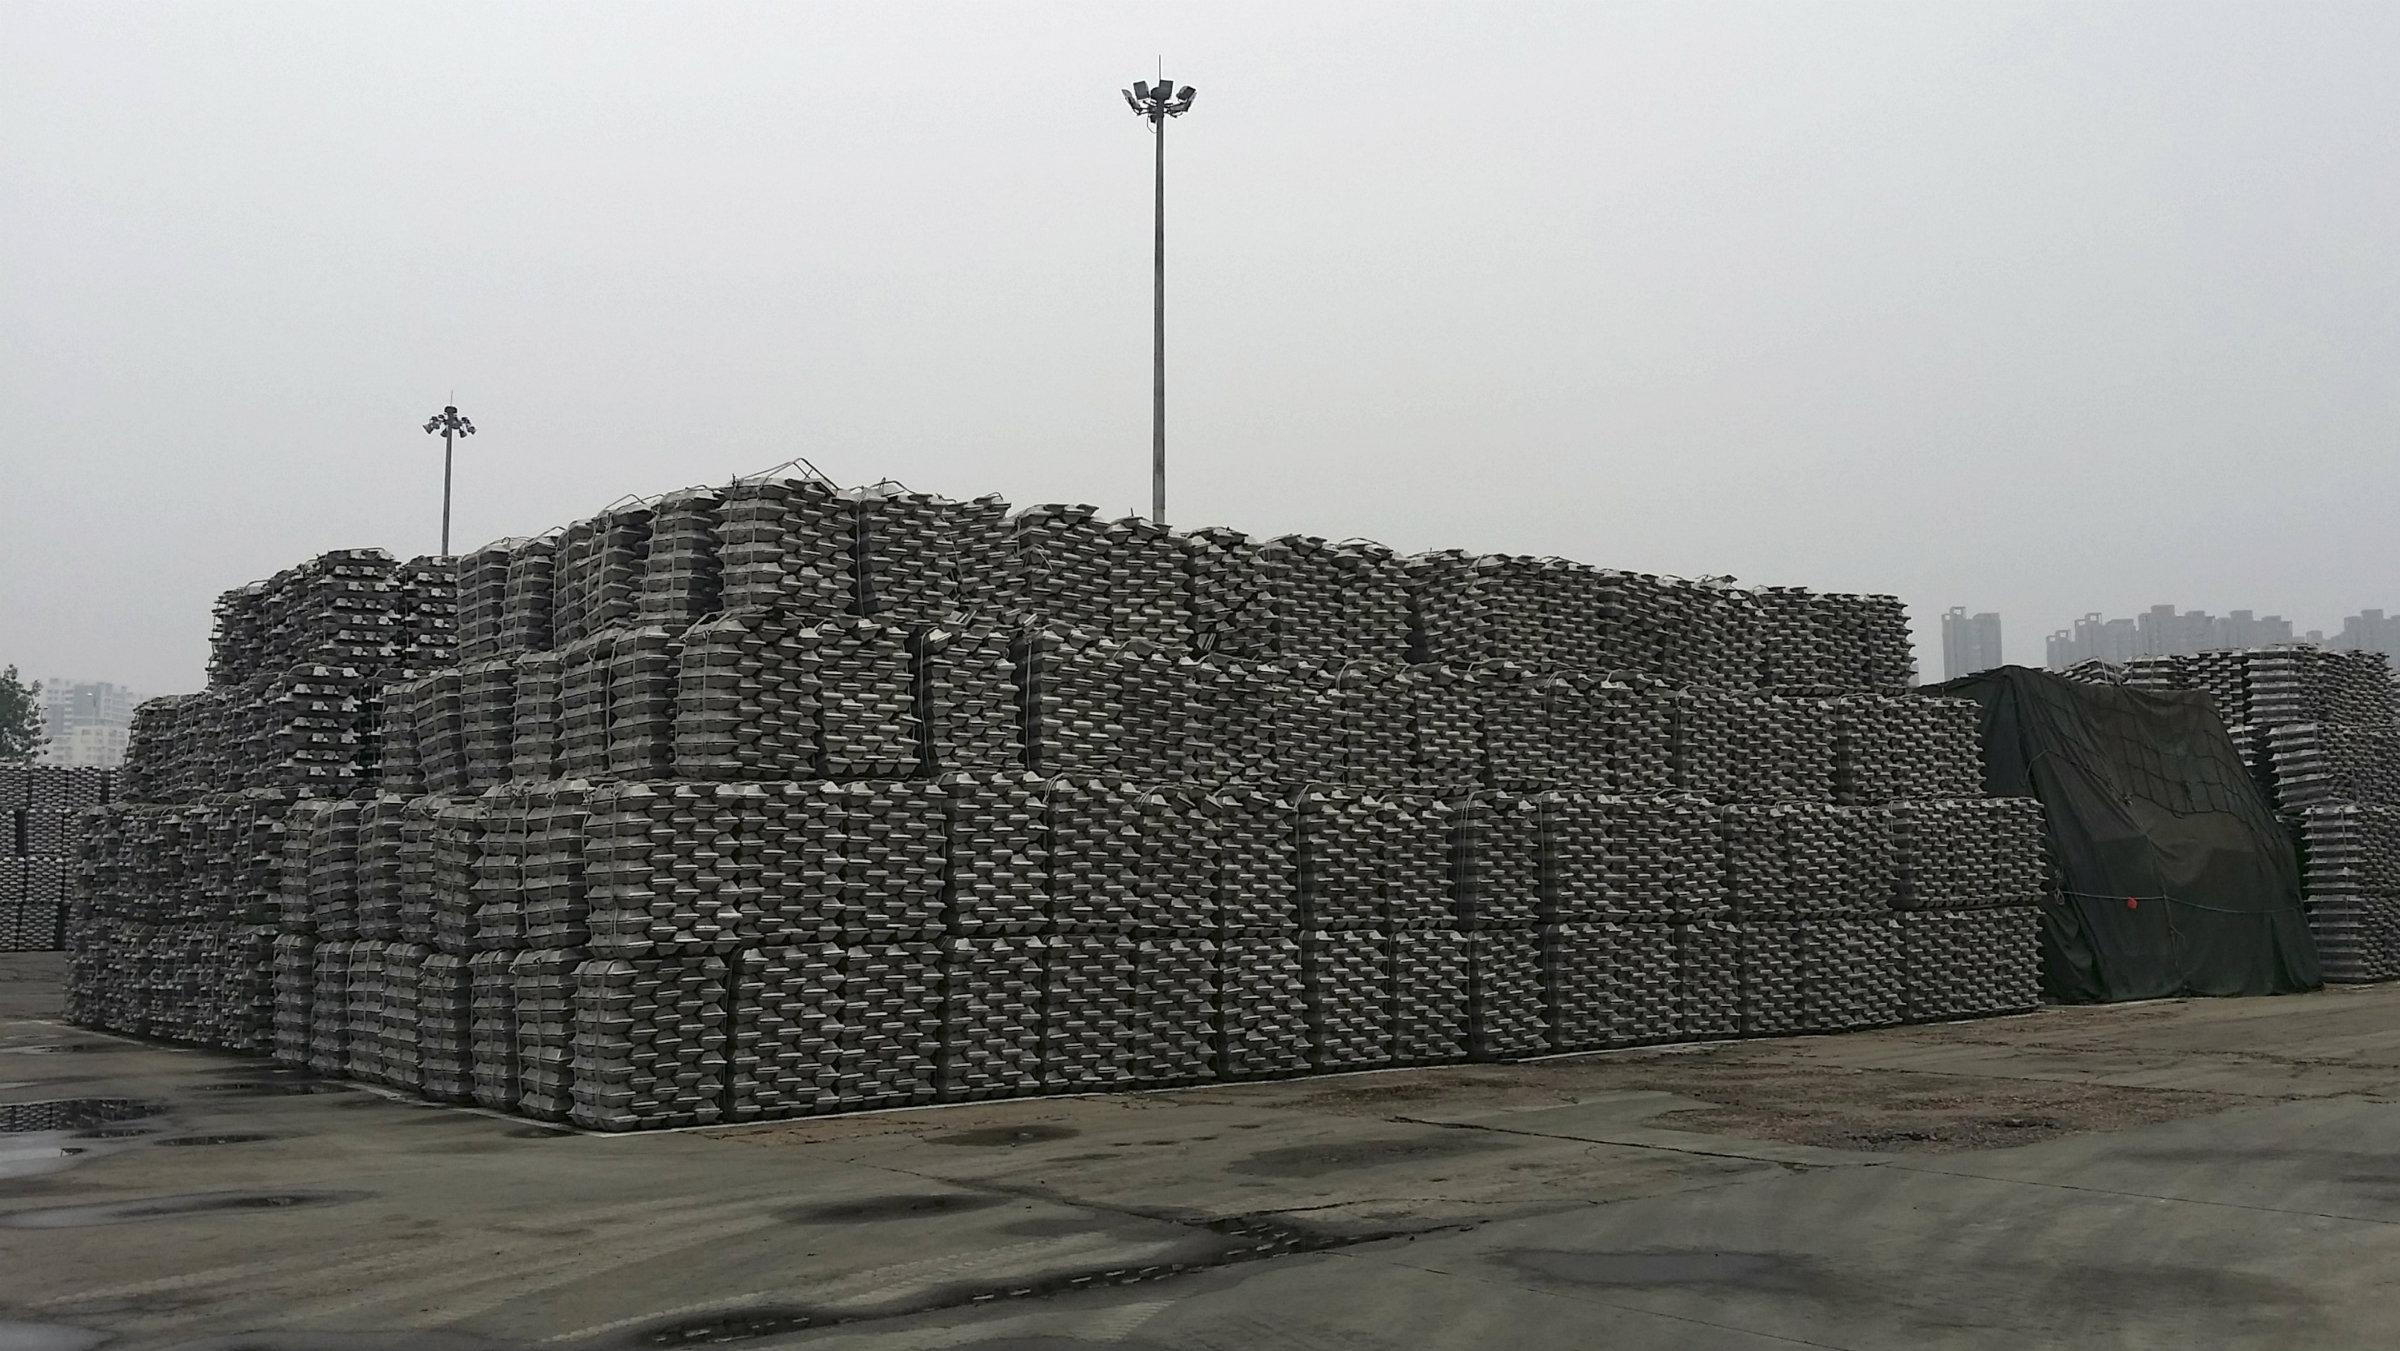 Aluminum stocks in Qingdao port.